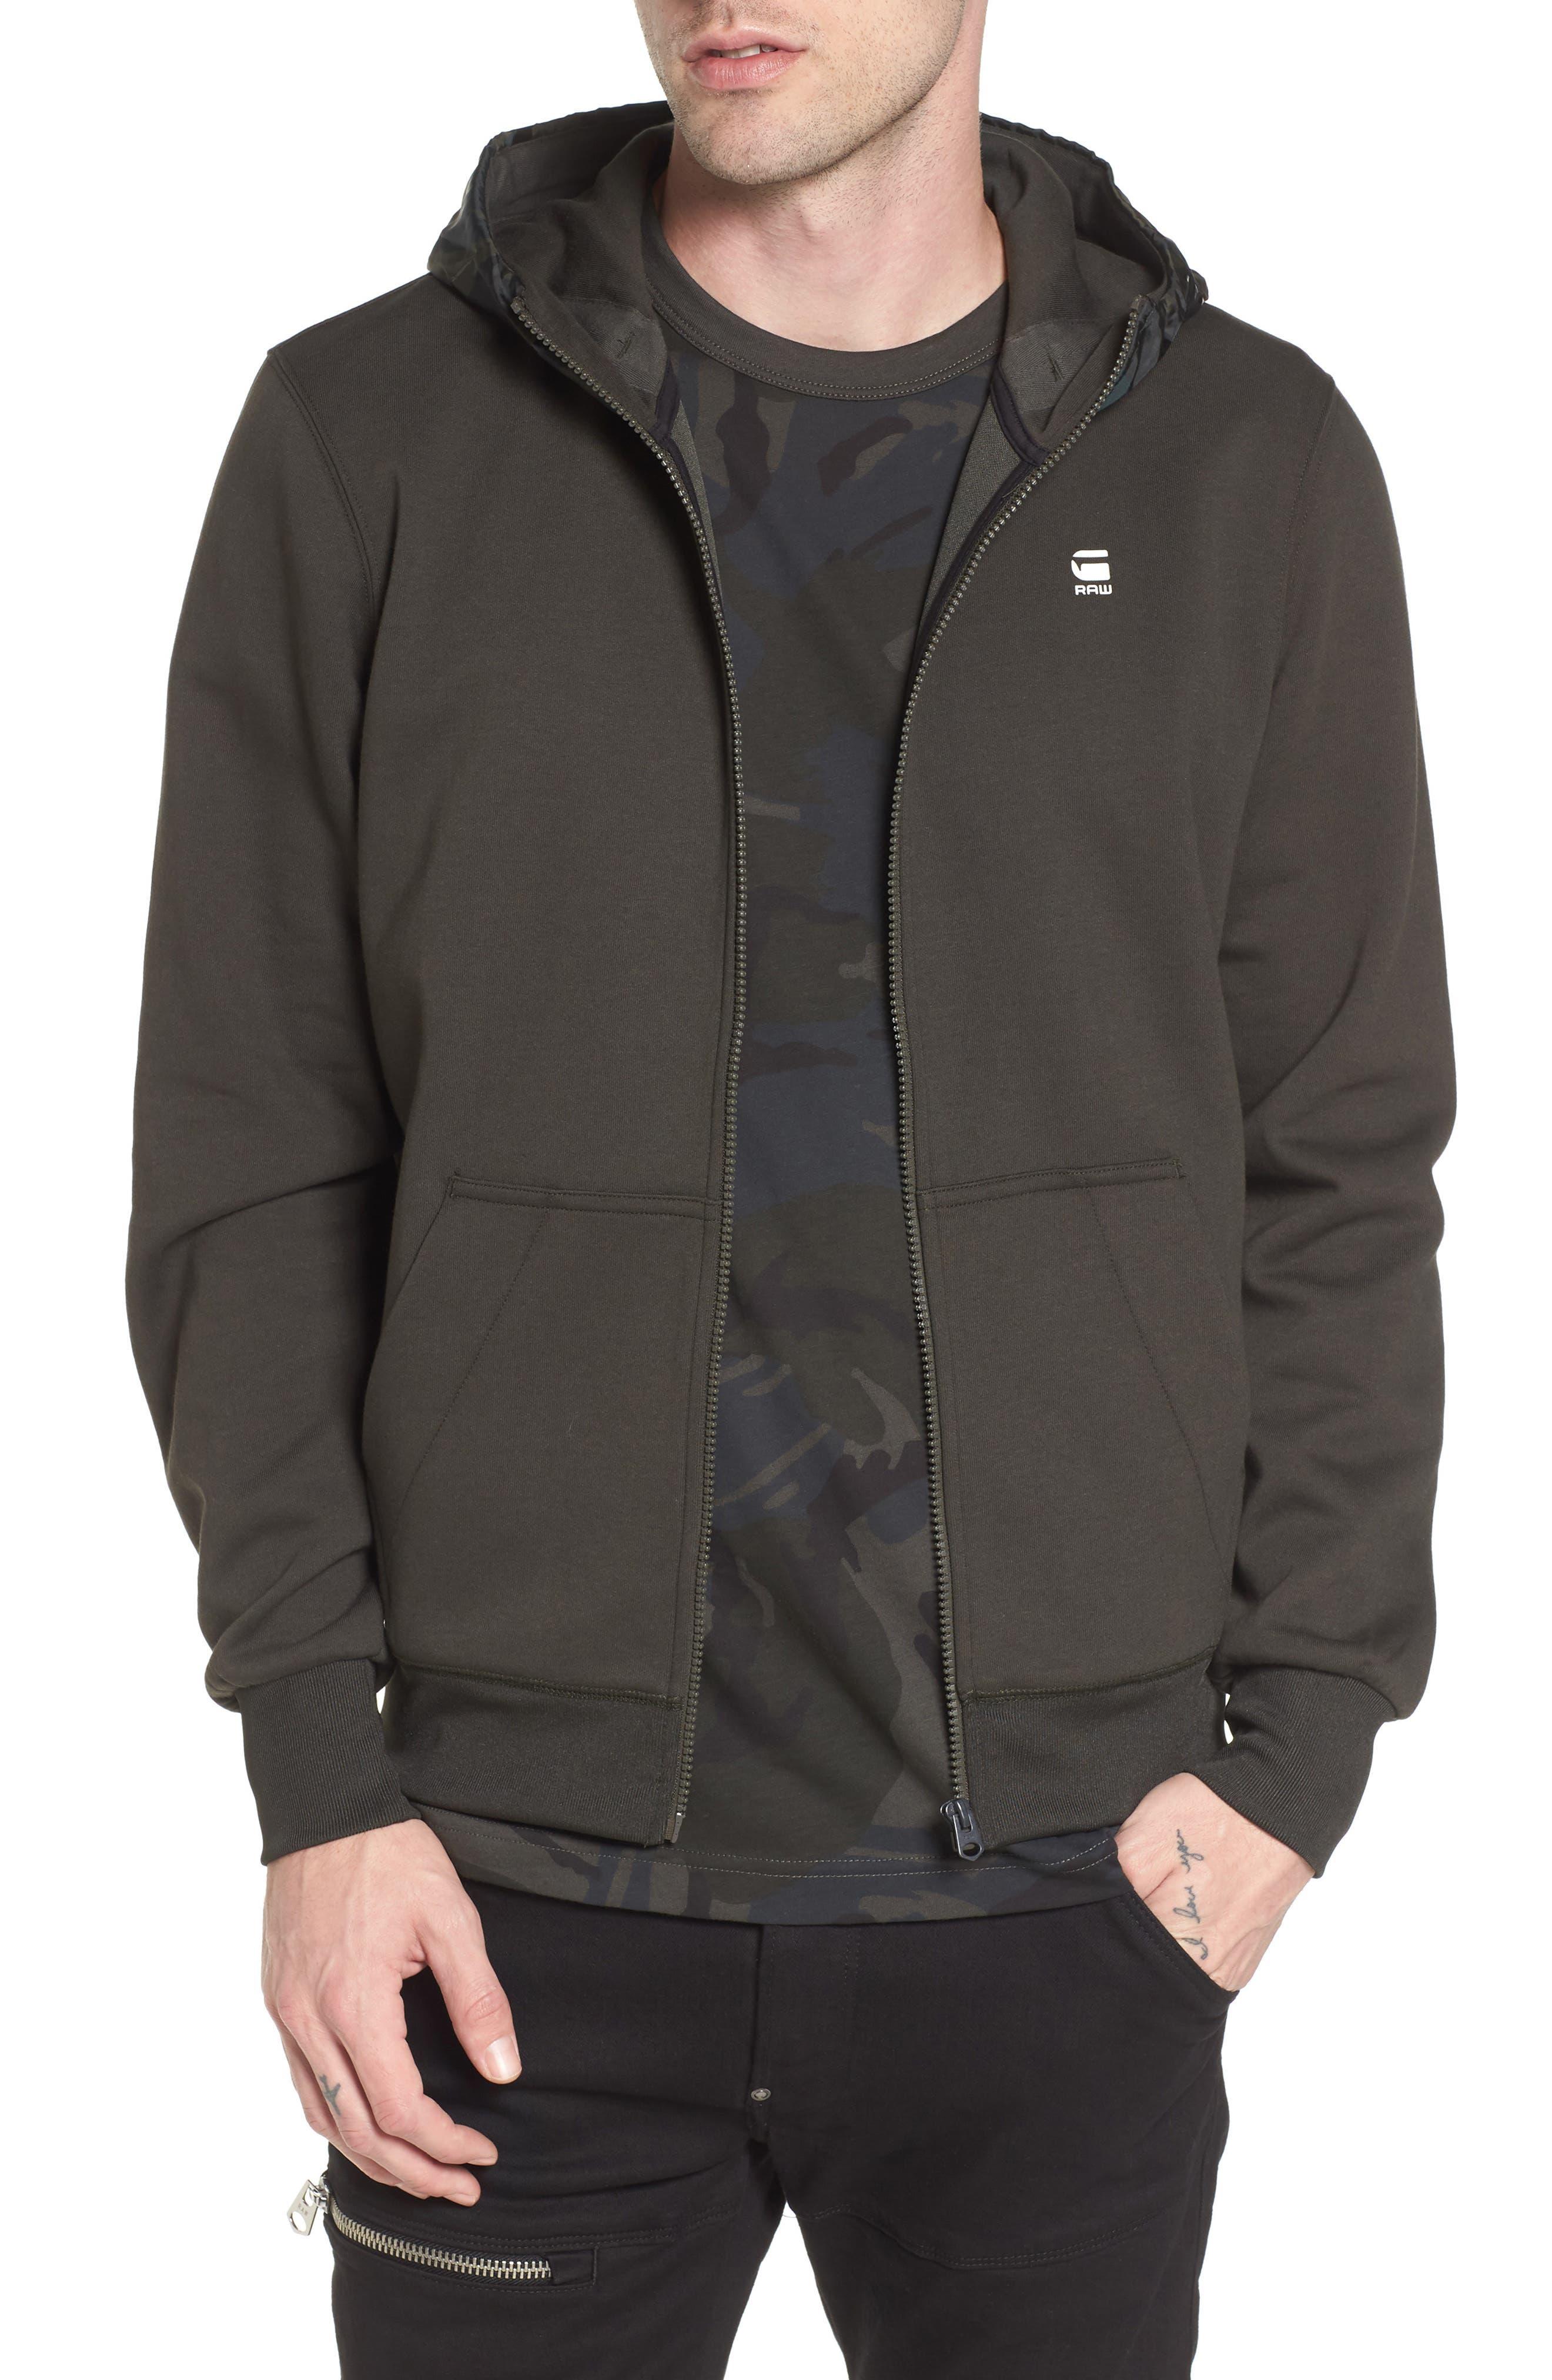 Alternate Image 1 Selected - G-Star Raw Core Hooded Zip Sweatshirt